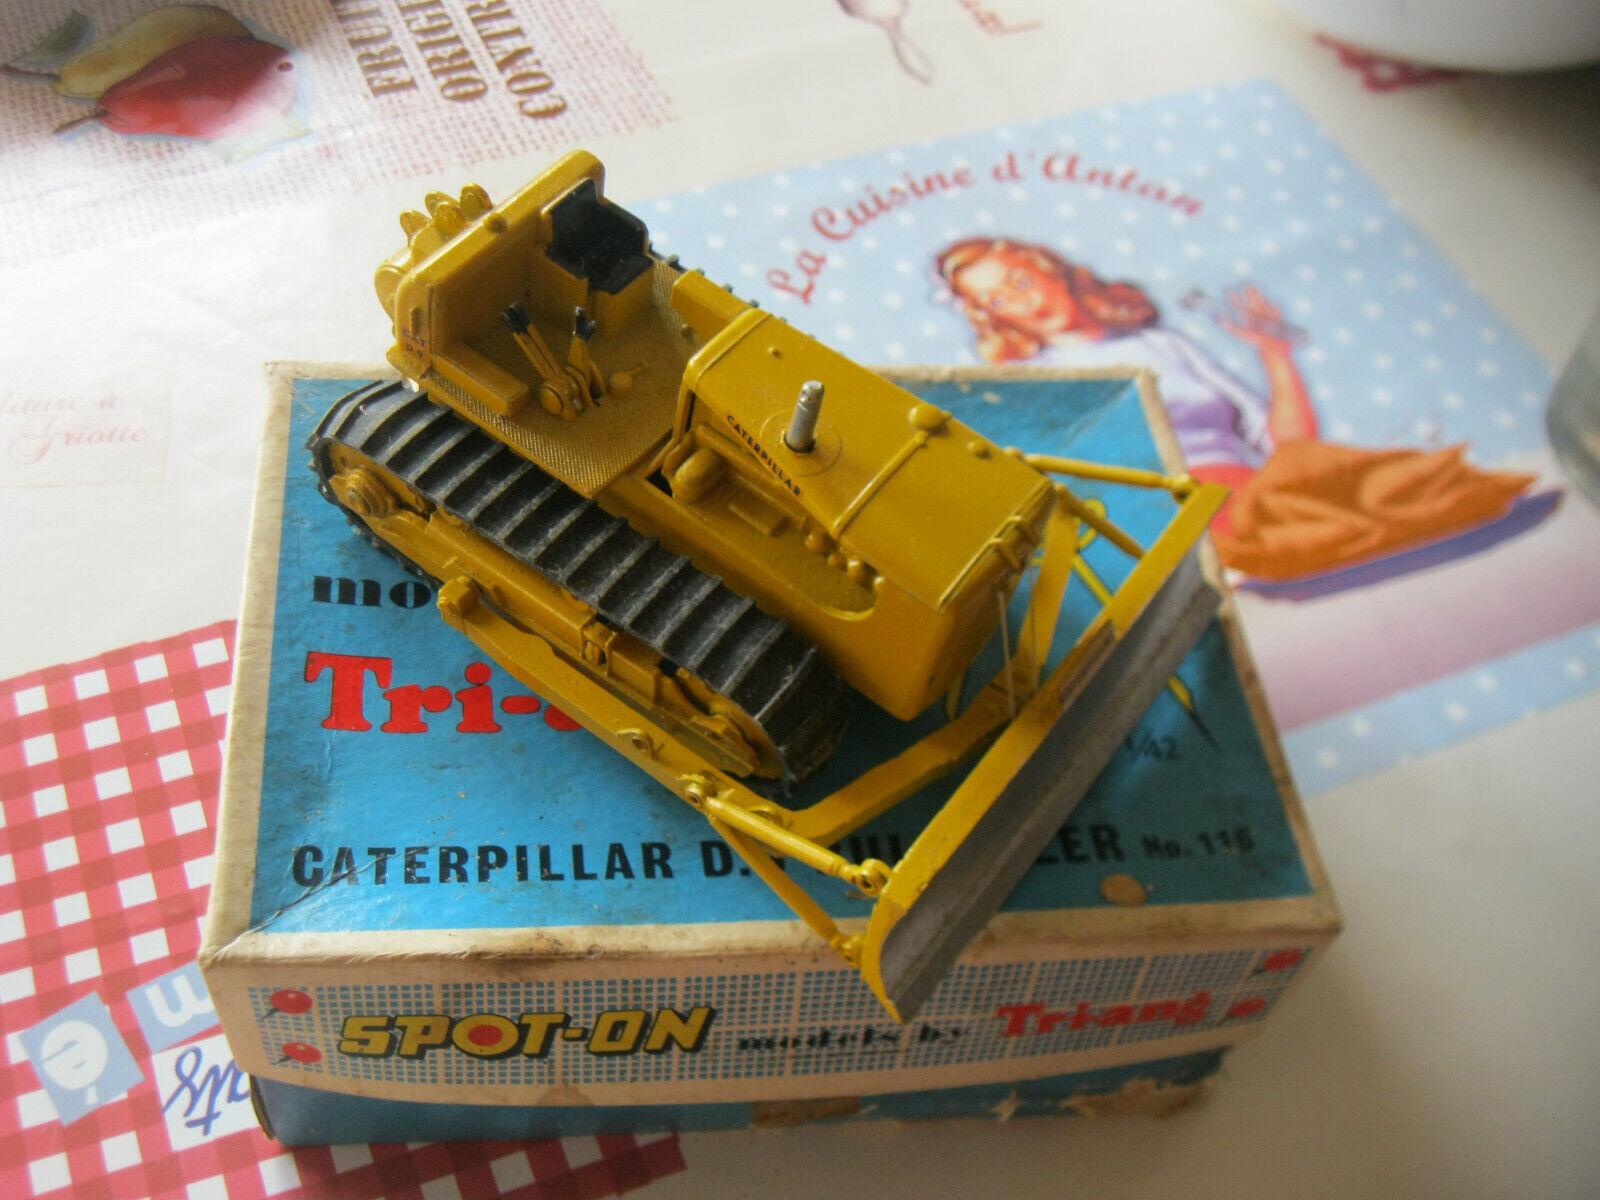 Spot-on models by Tri-ang caterpillar D.9 Bulldozer no 116